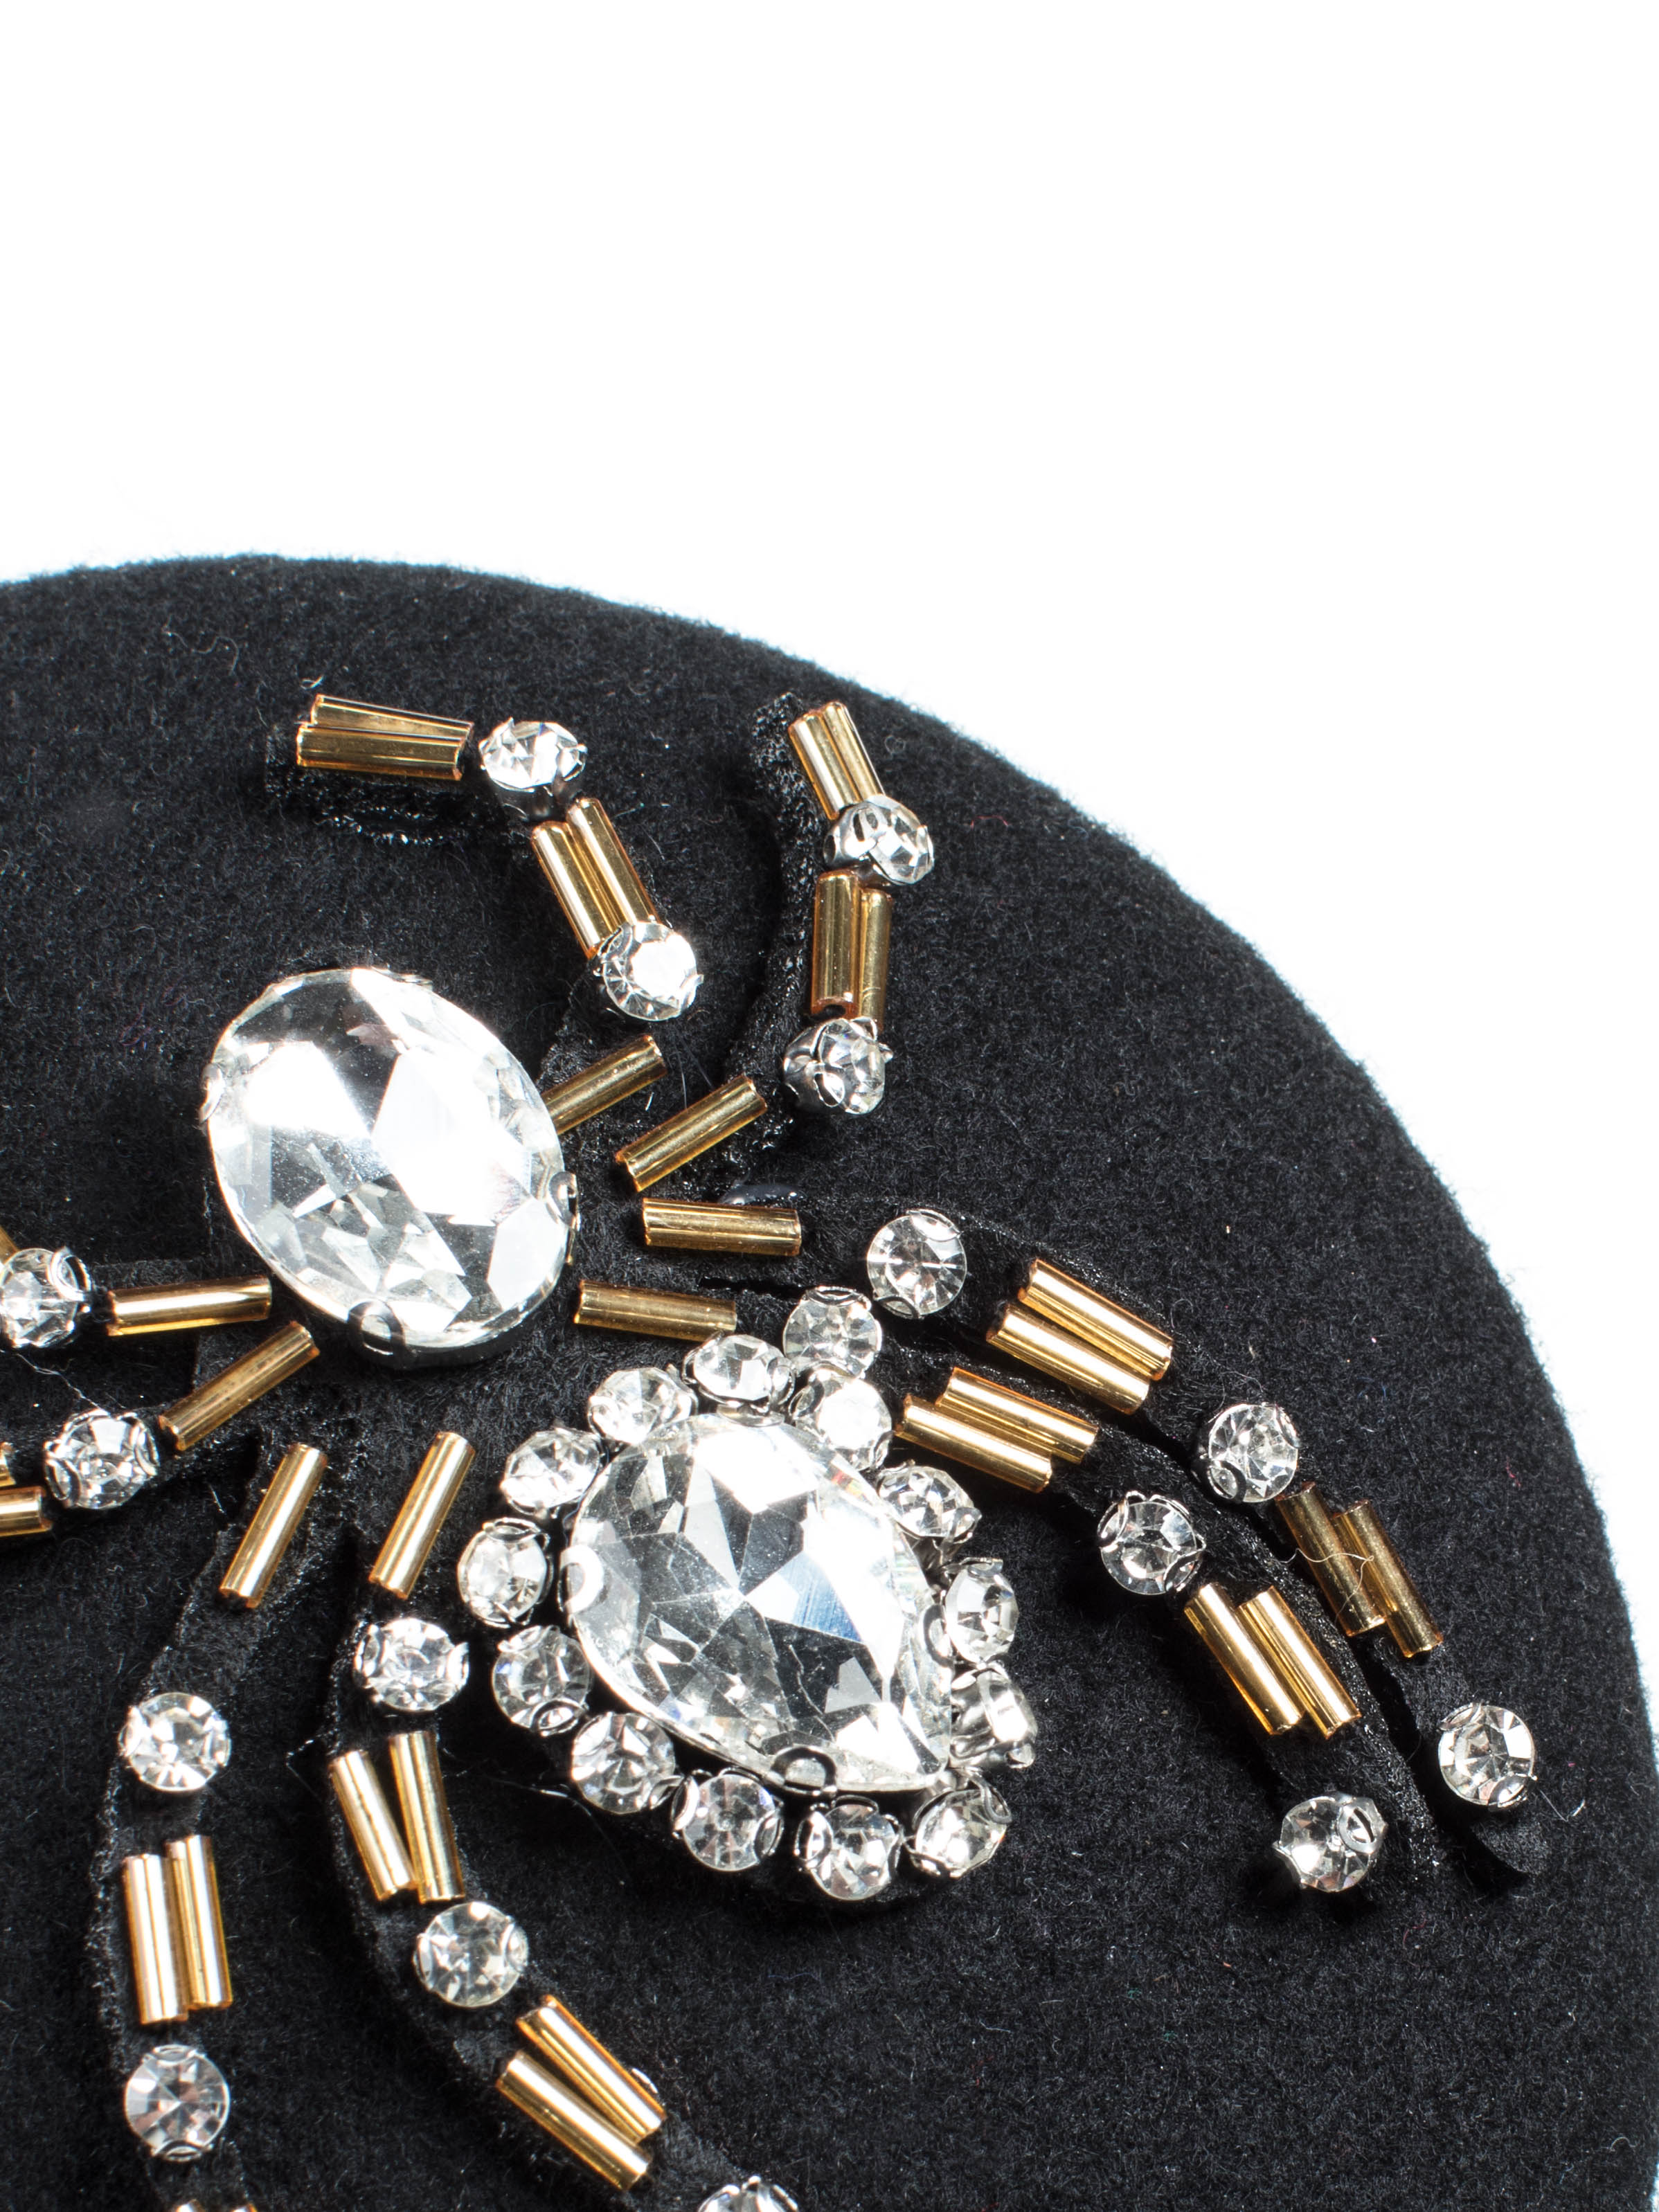 Blyton cocktail hat close up